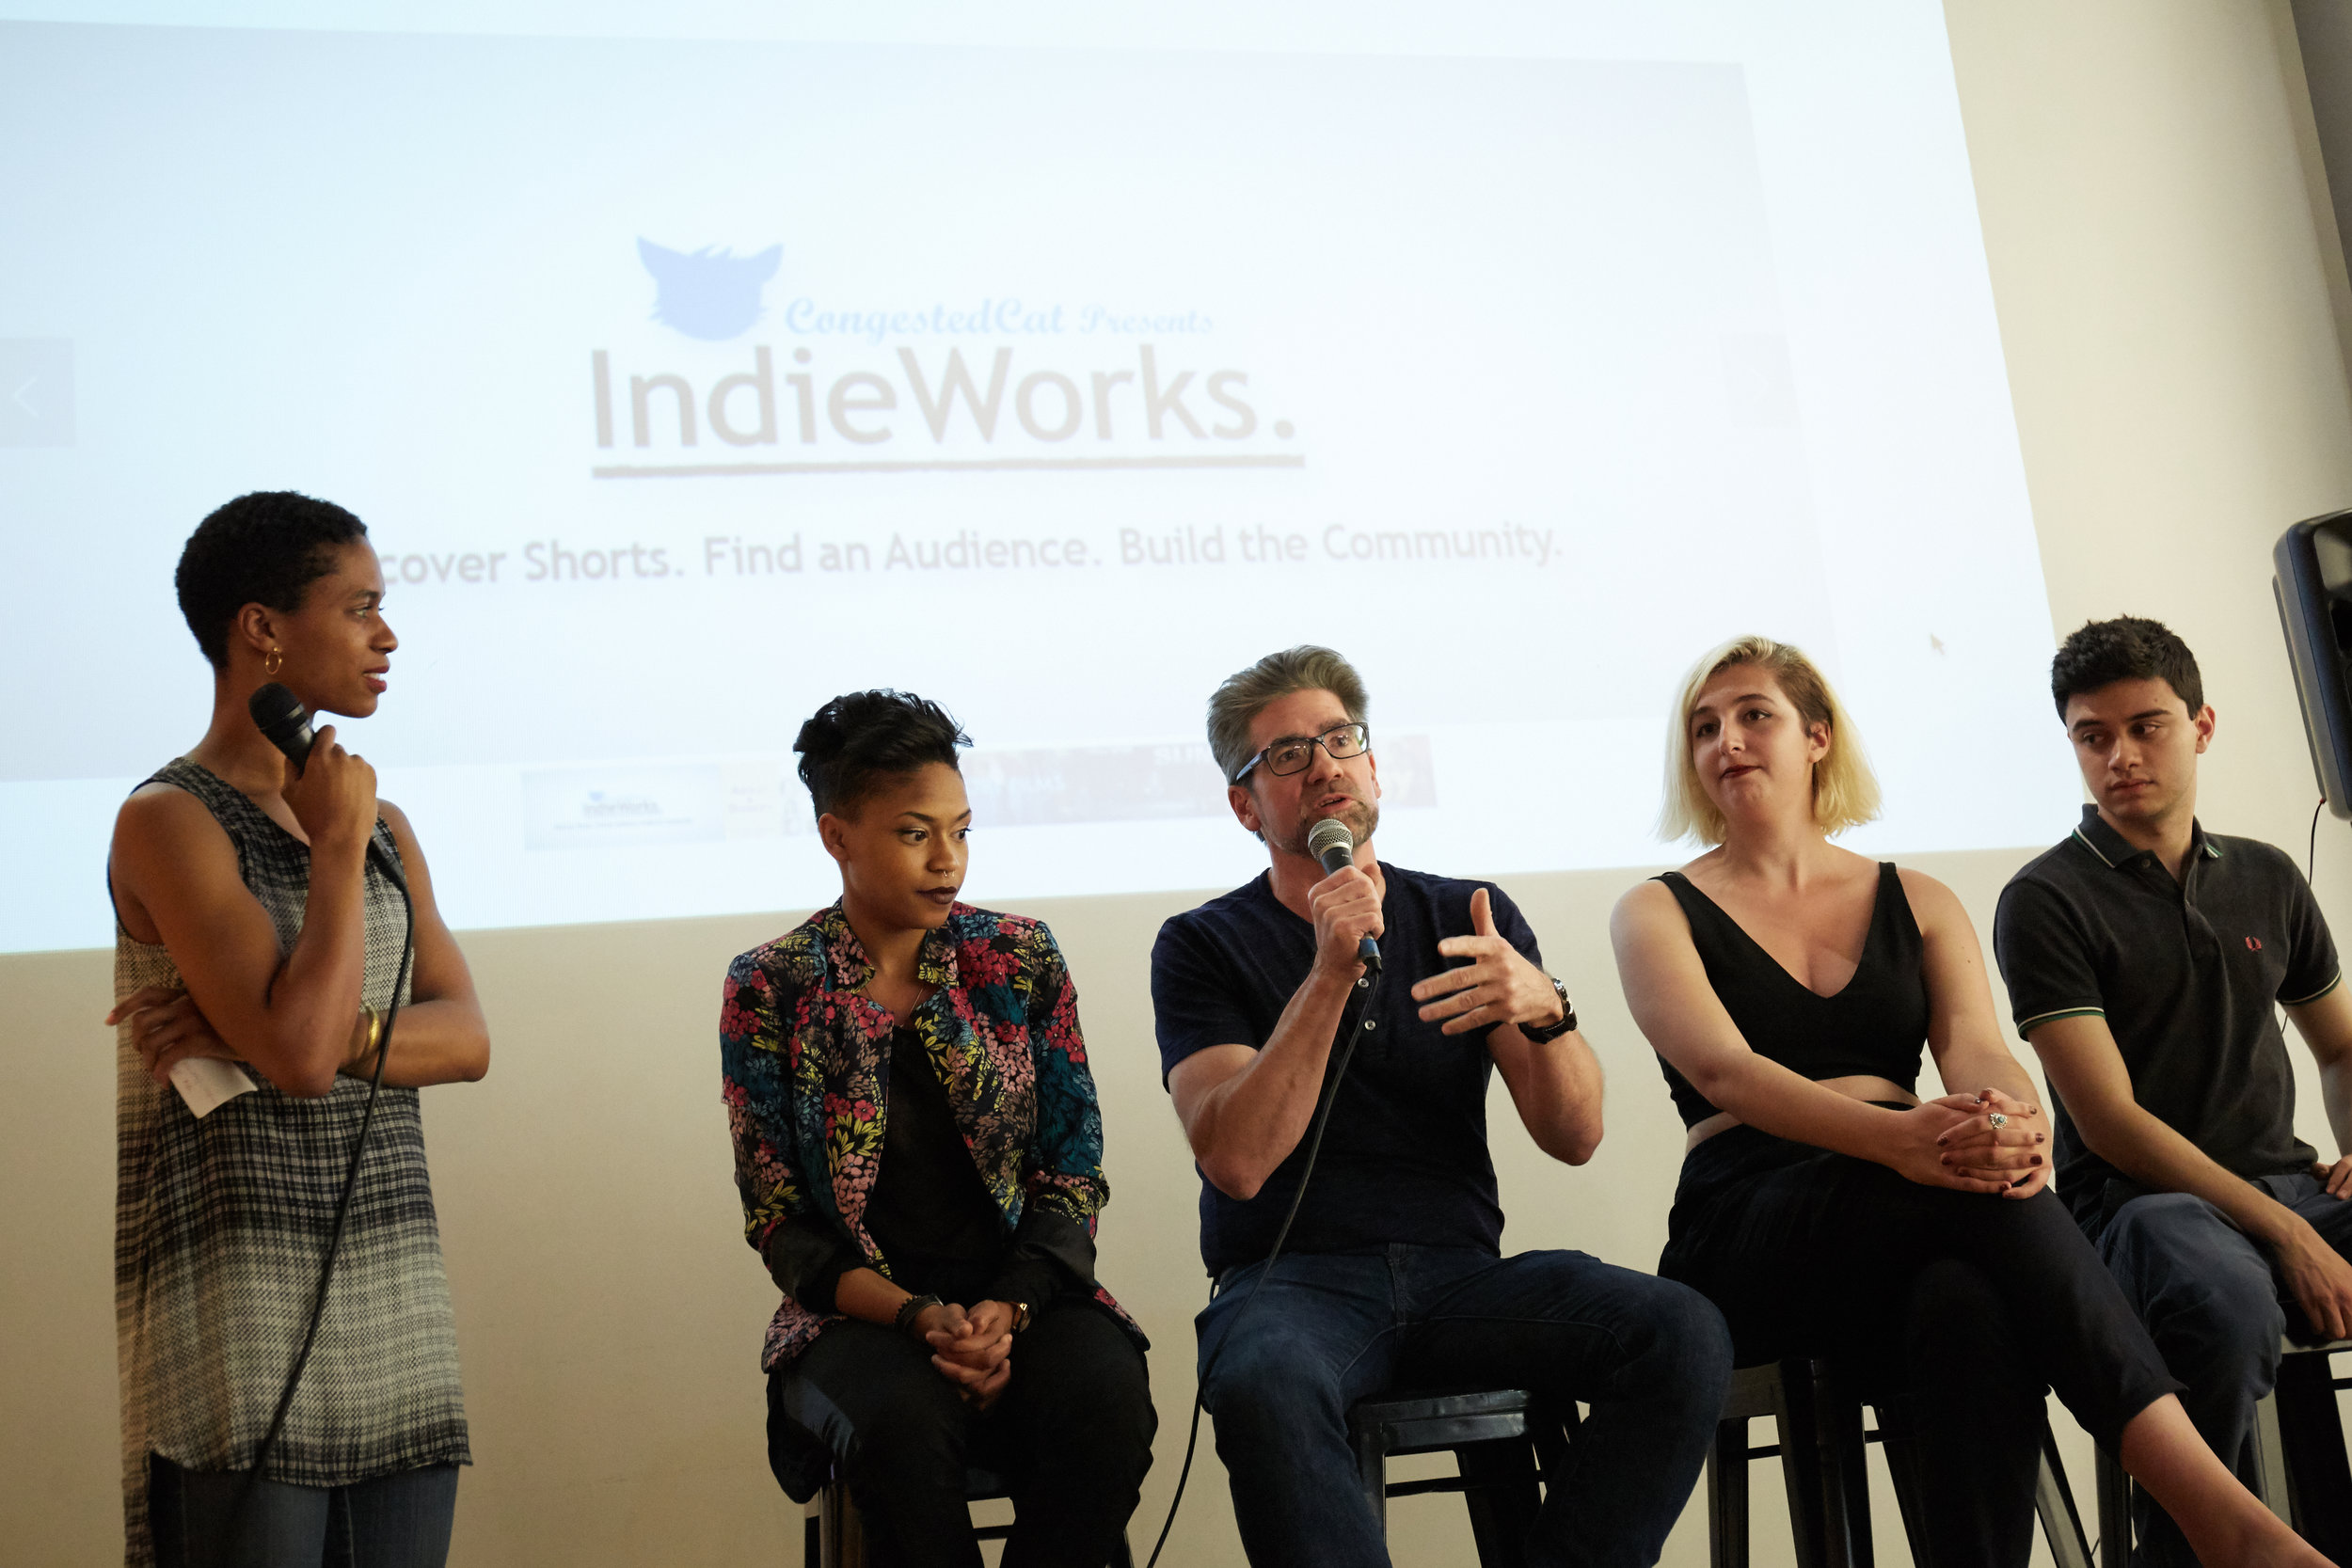 IndieWorks by Carlos Molina.76 8.32.27 PM.jpg